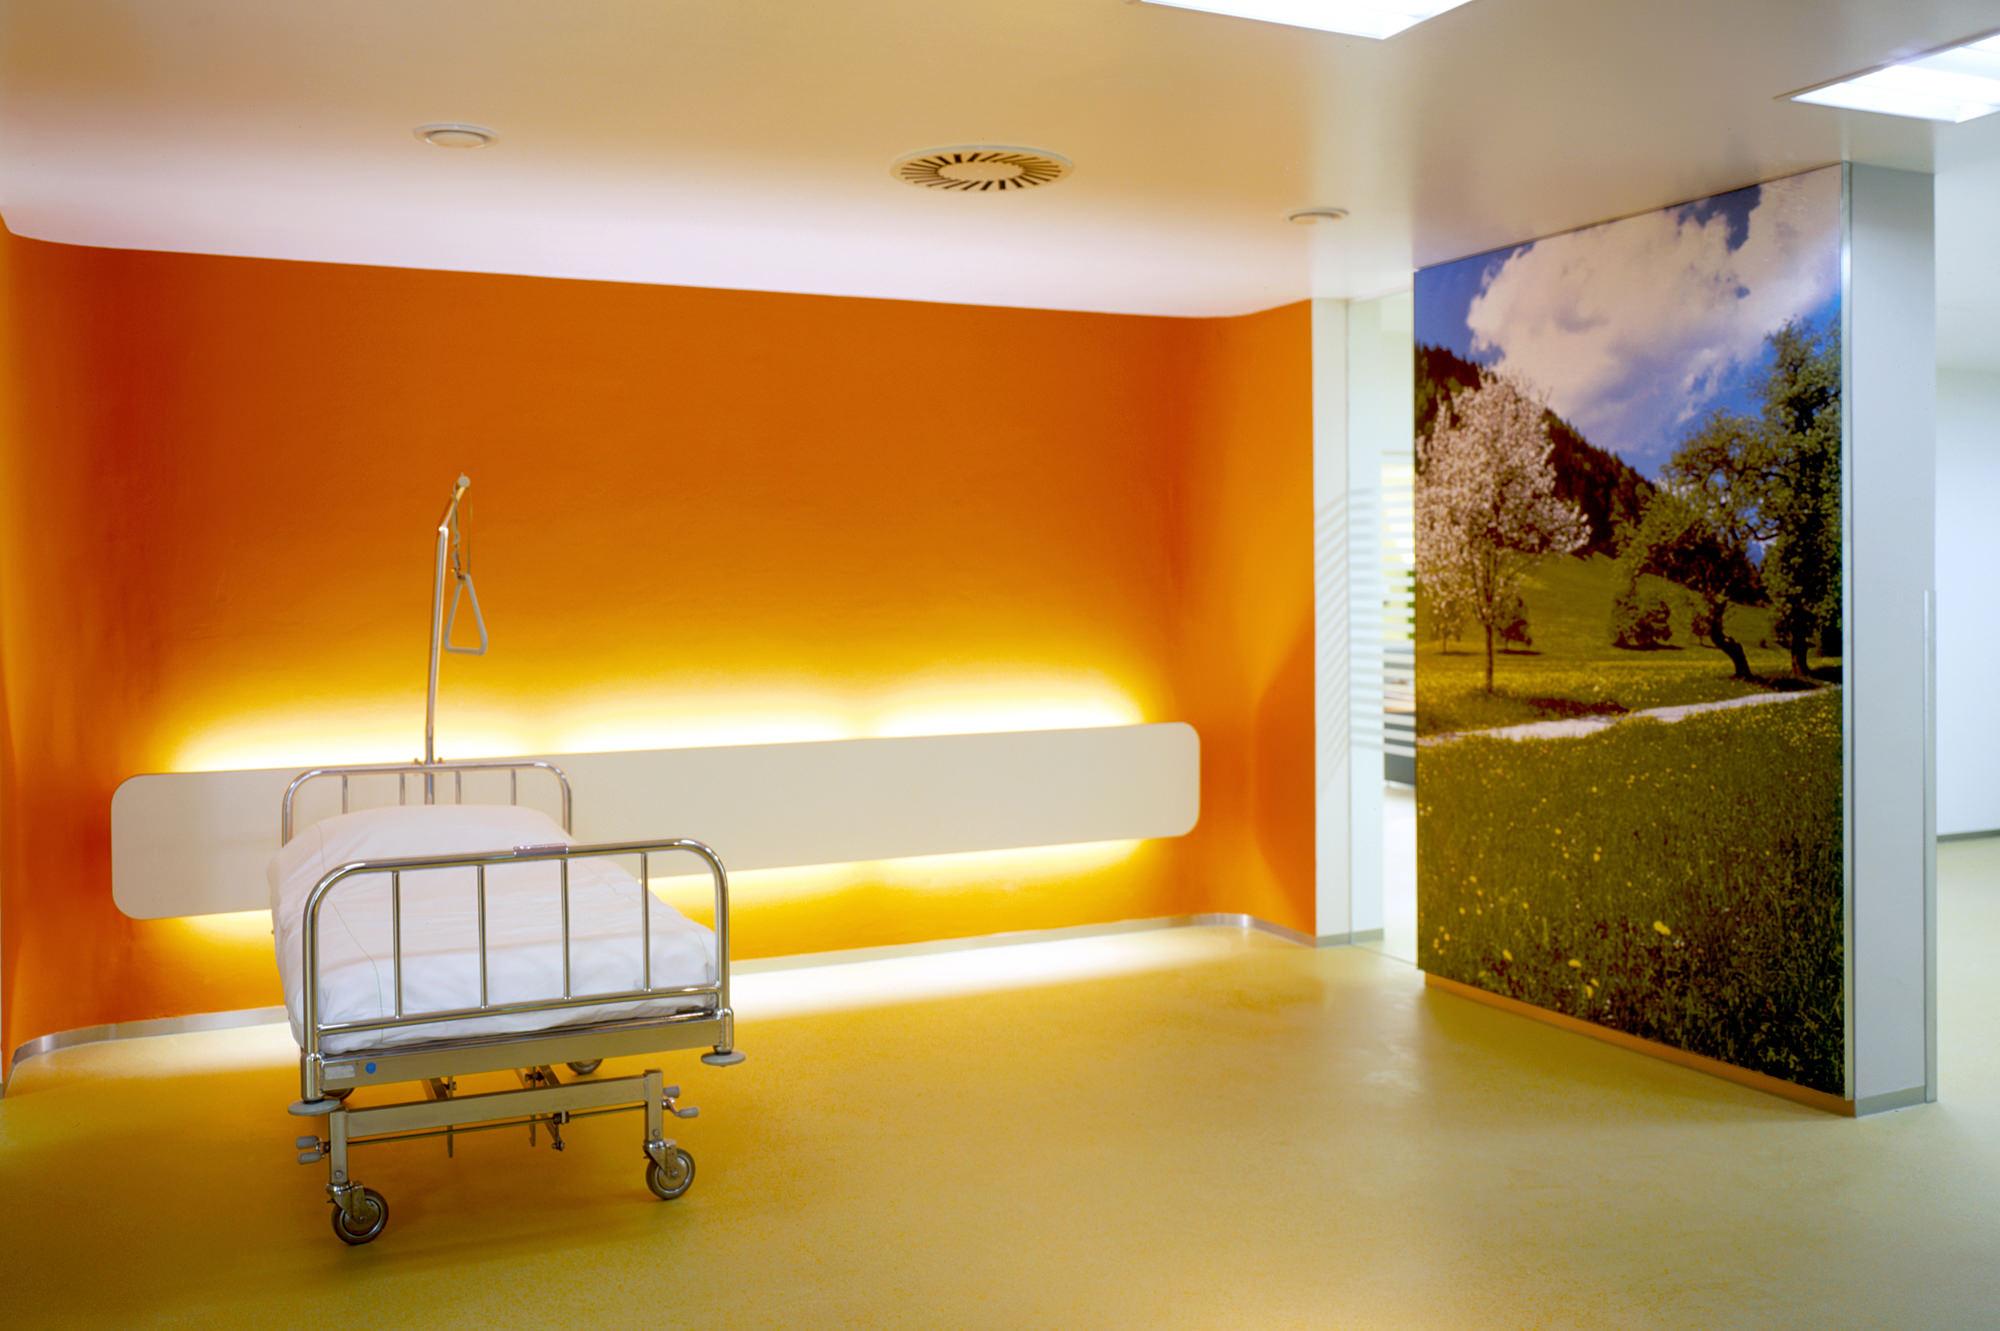 krankenhaus_kitzbuehel_03_umbau_sanierung__junger_beer_architektur